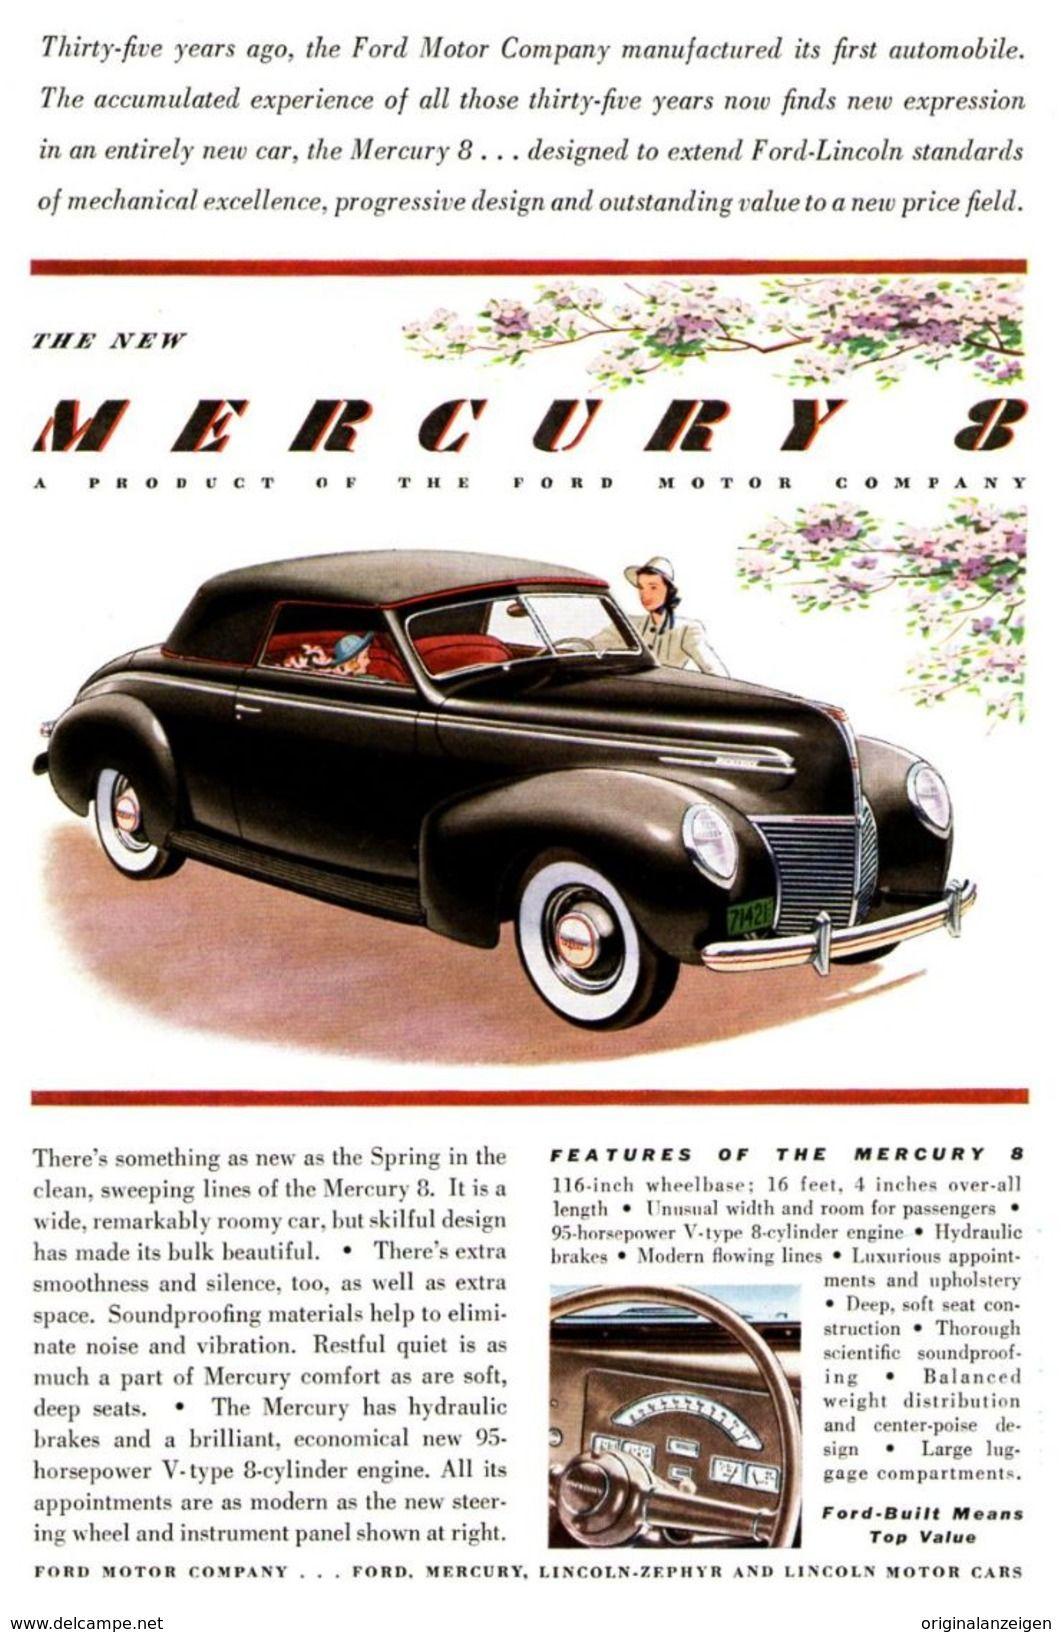 USA : Original - Anzeige / Advertise 1939 (ENGLISH) - MERCURY 8 CAR ...